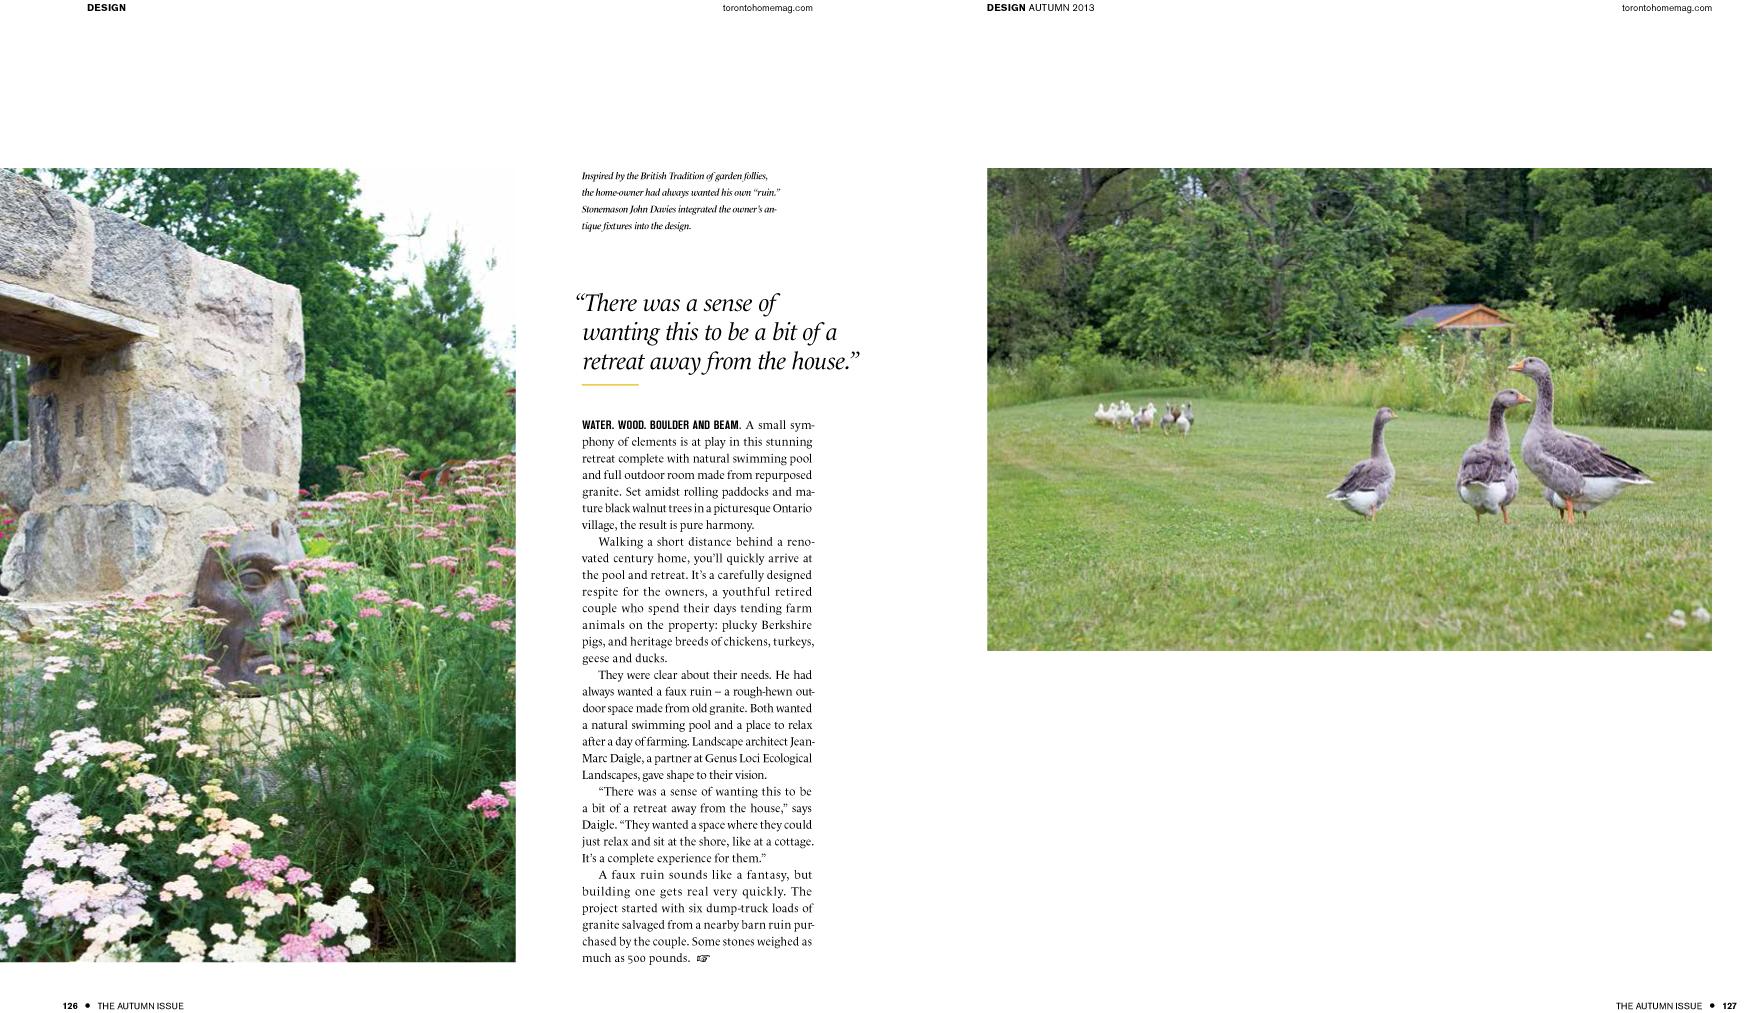 TorontoHome - CountryHomes2013 - MarshStreet-2.jpg